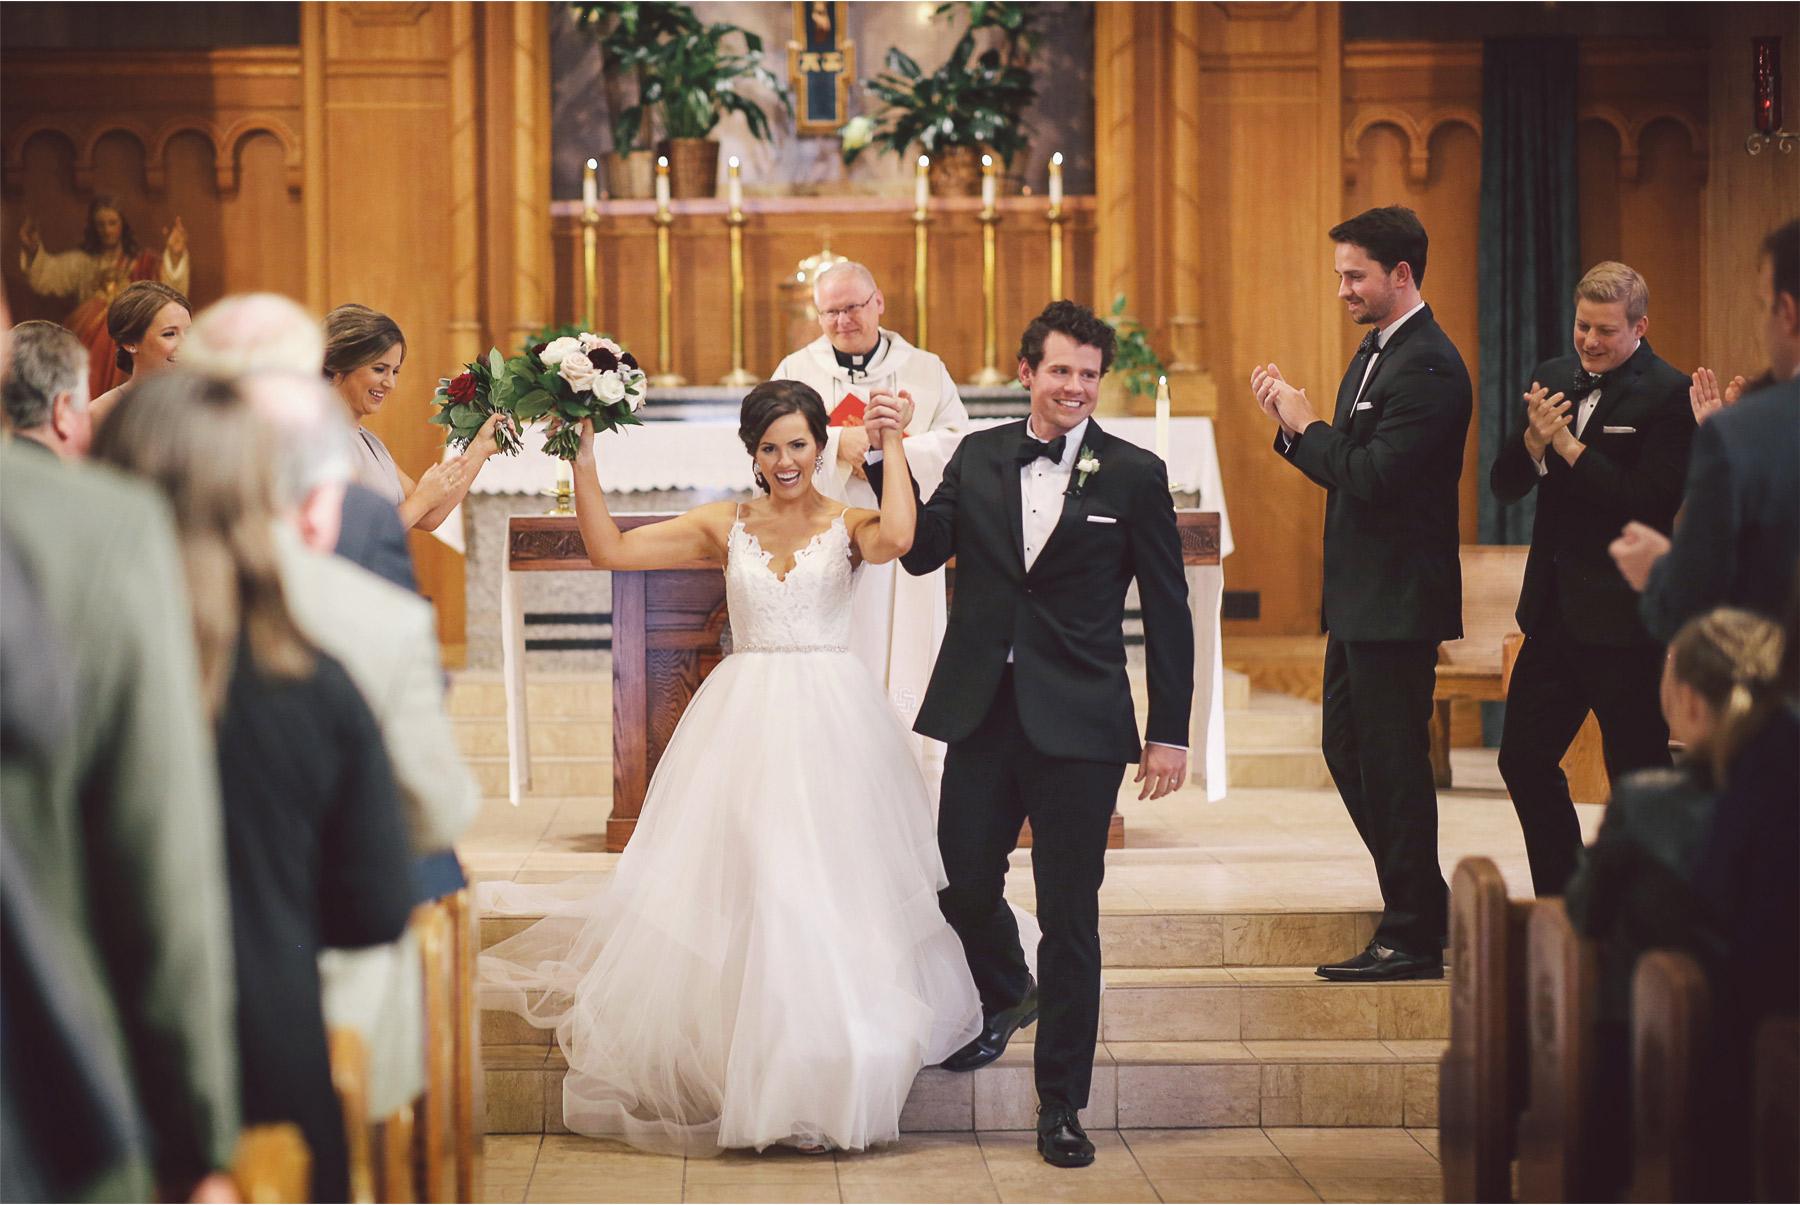 13-Brainerd-Minnesota-Wedding-Photography-by-Vick-Photography-St.-Francis-Catholic-Church-Ceremony-Bethany-and-Anthony.jpg